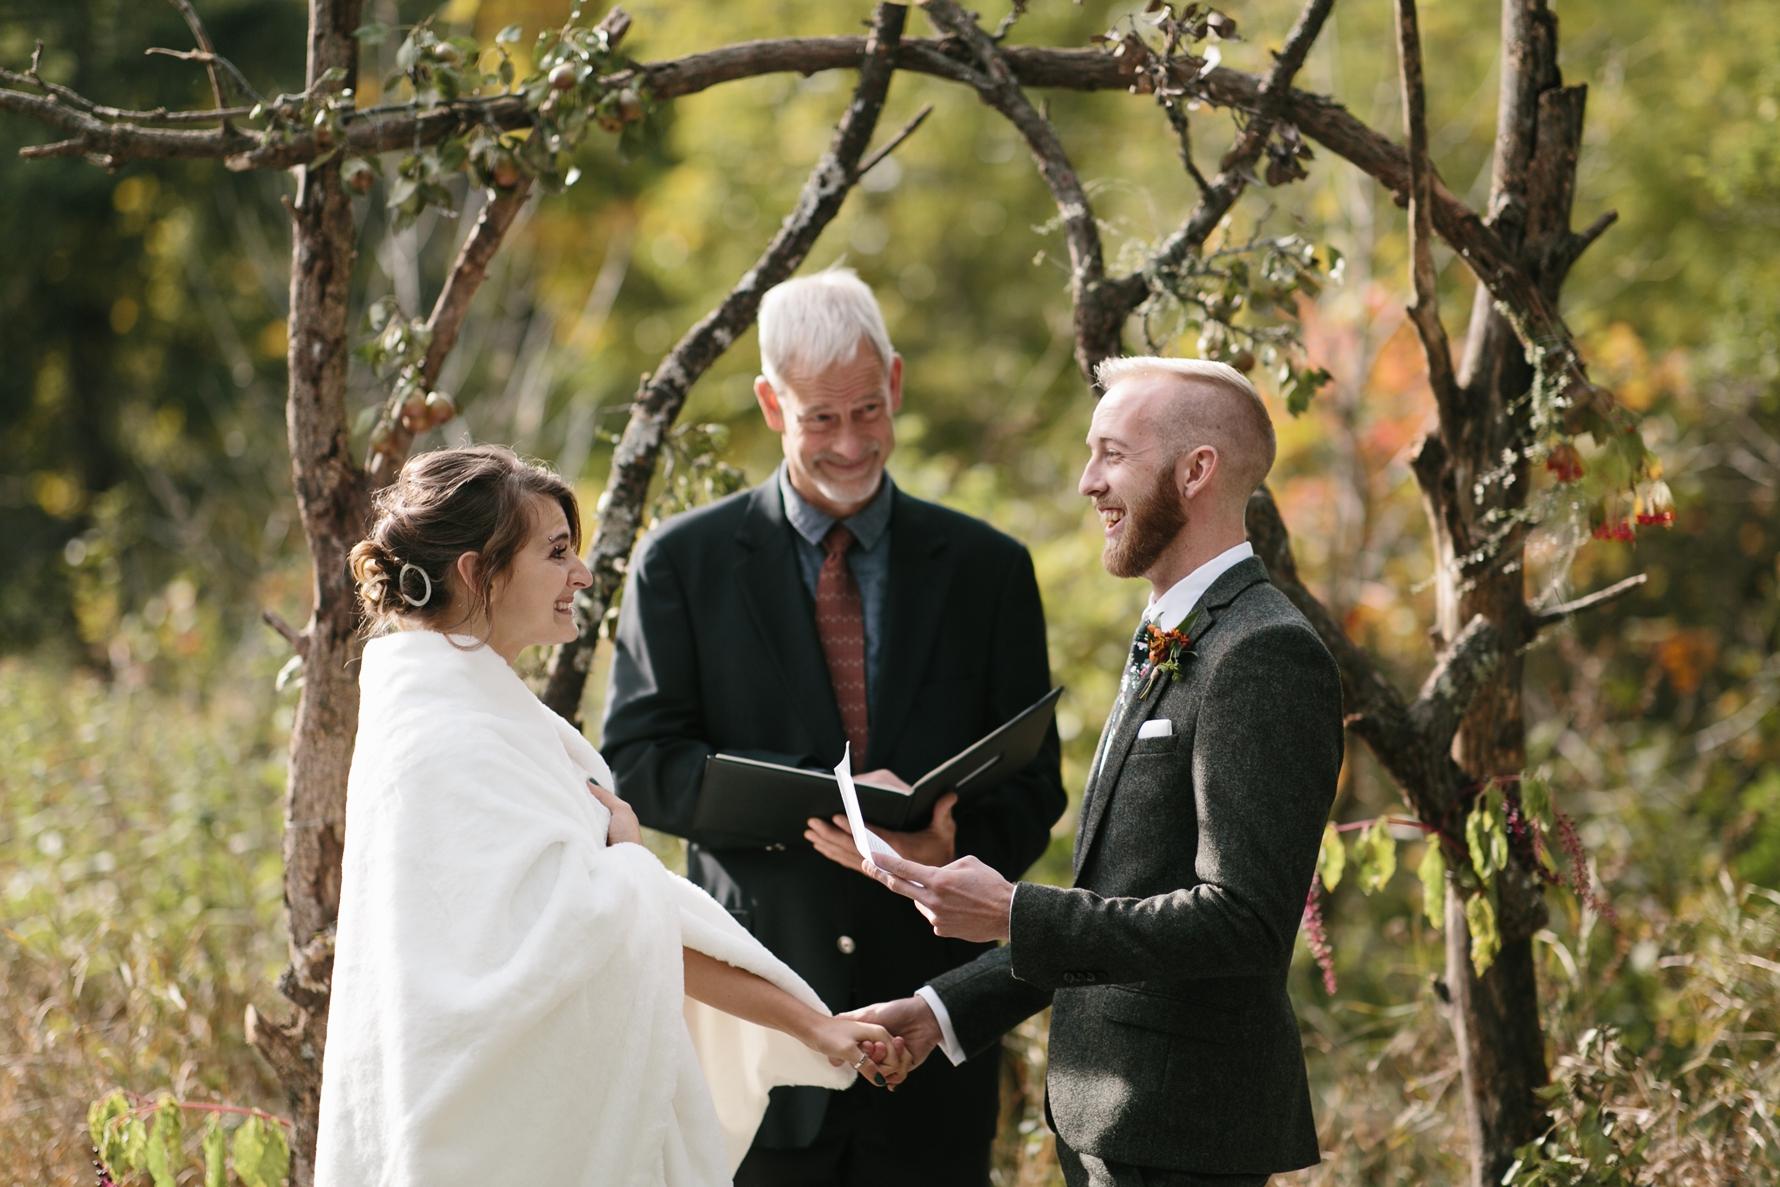 norris-traverse-city-wedding-44.JPG